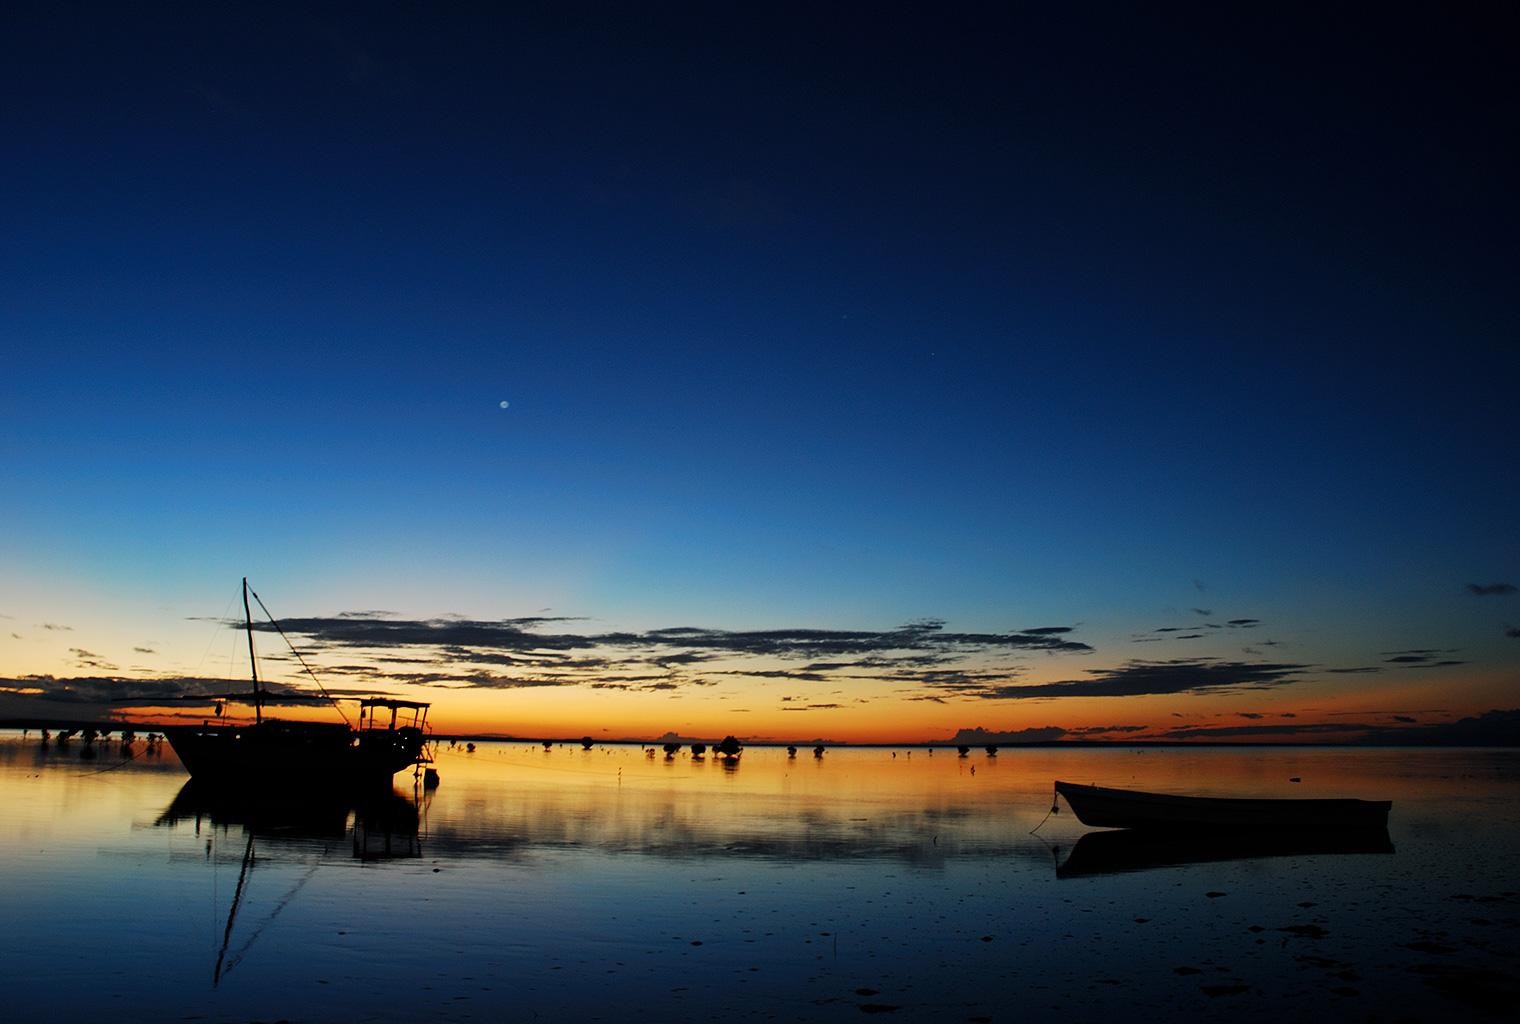 Ibo-Island-Mozambique-Boats